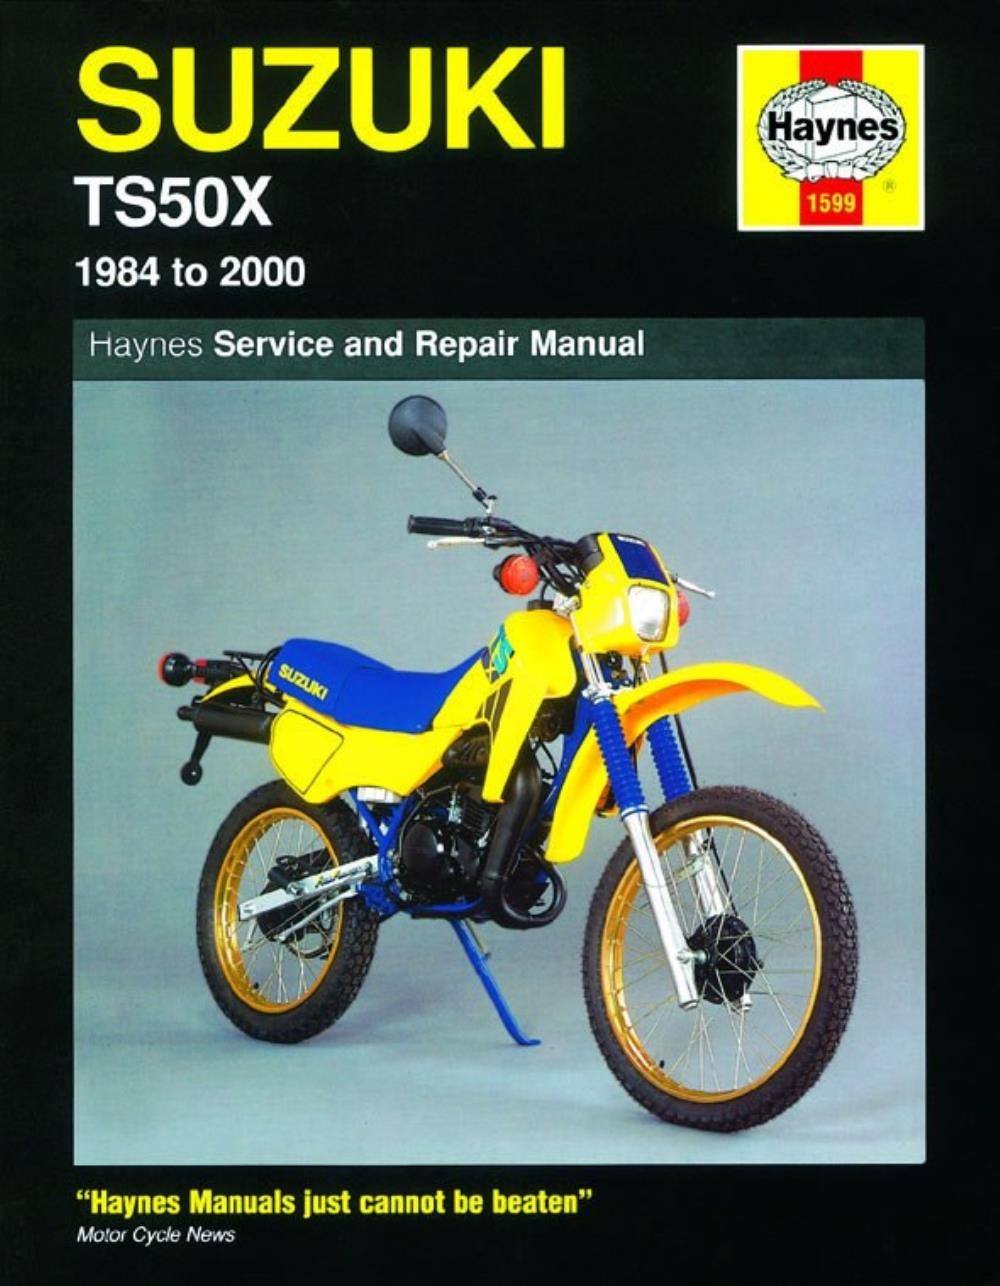 hight resolution of haynes manual 1599 for suzuki ts50x 1984 to 2000 for sale online ebay suzuki ts50x wiring diagram free